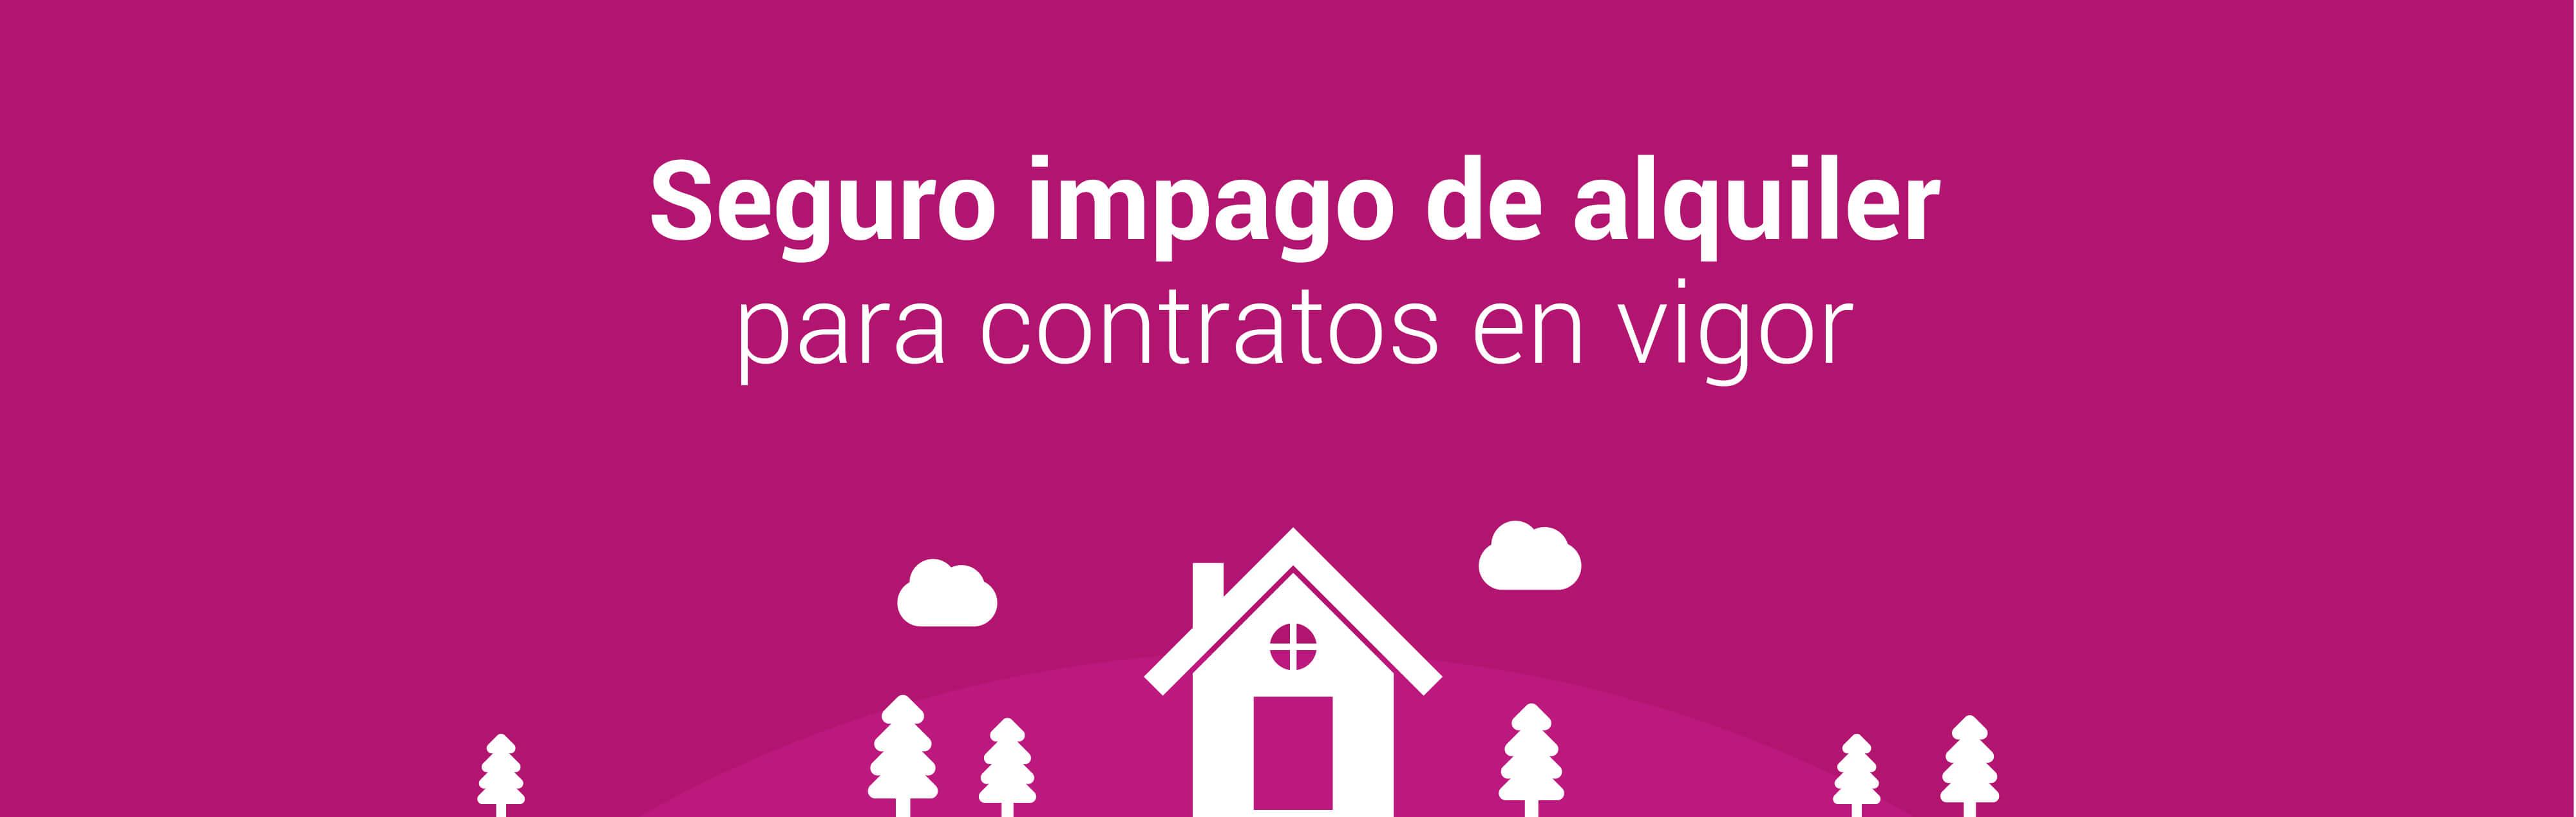 web-impago-contratos-firmados